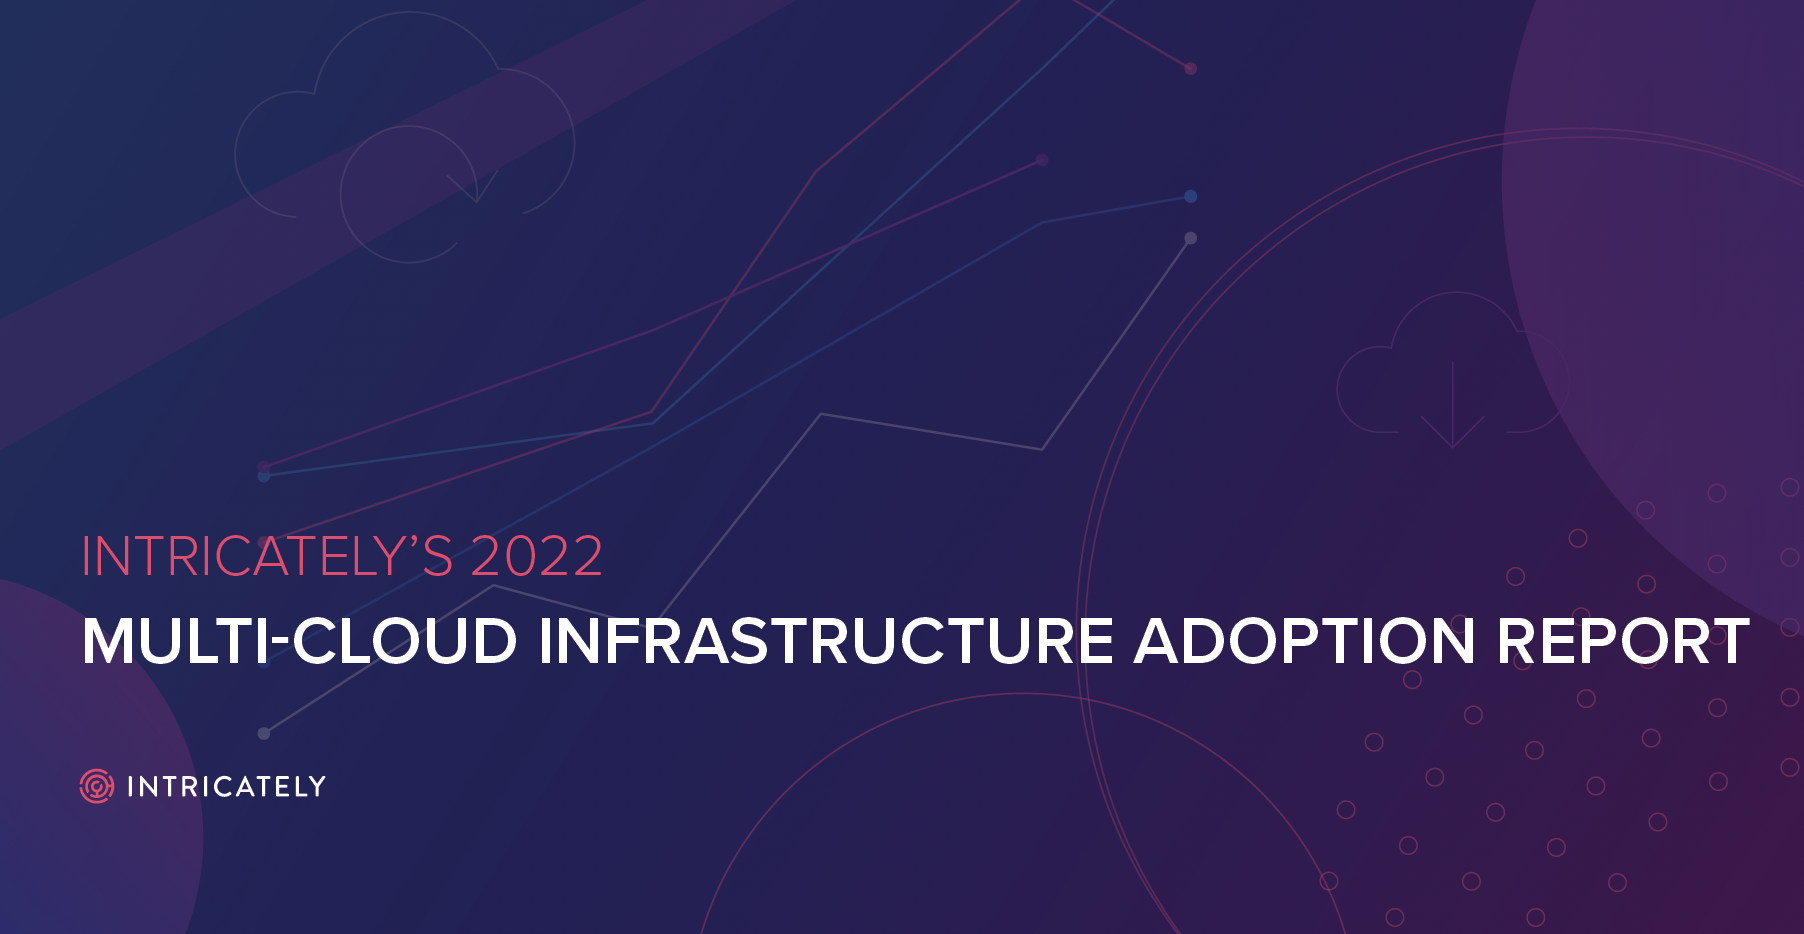 multi-cloud infrastructure adoption